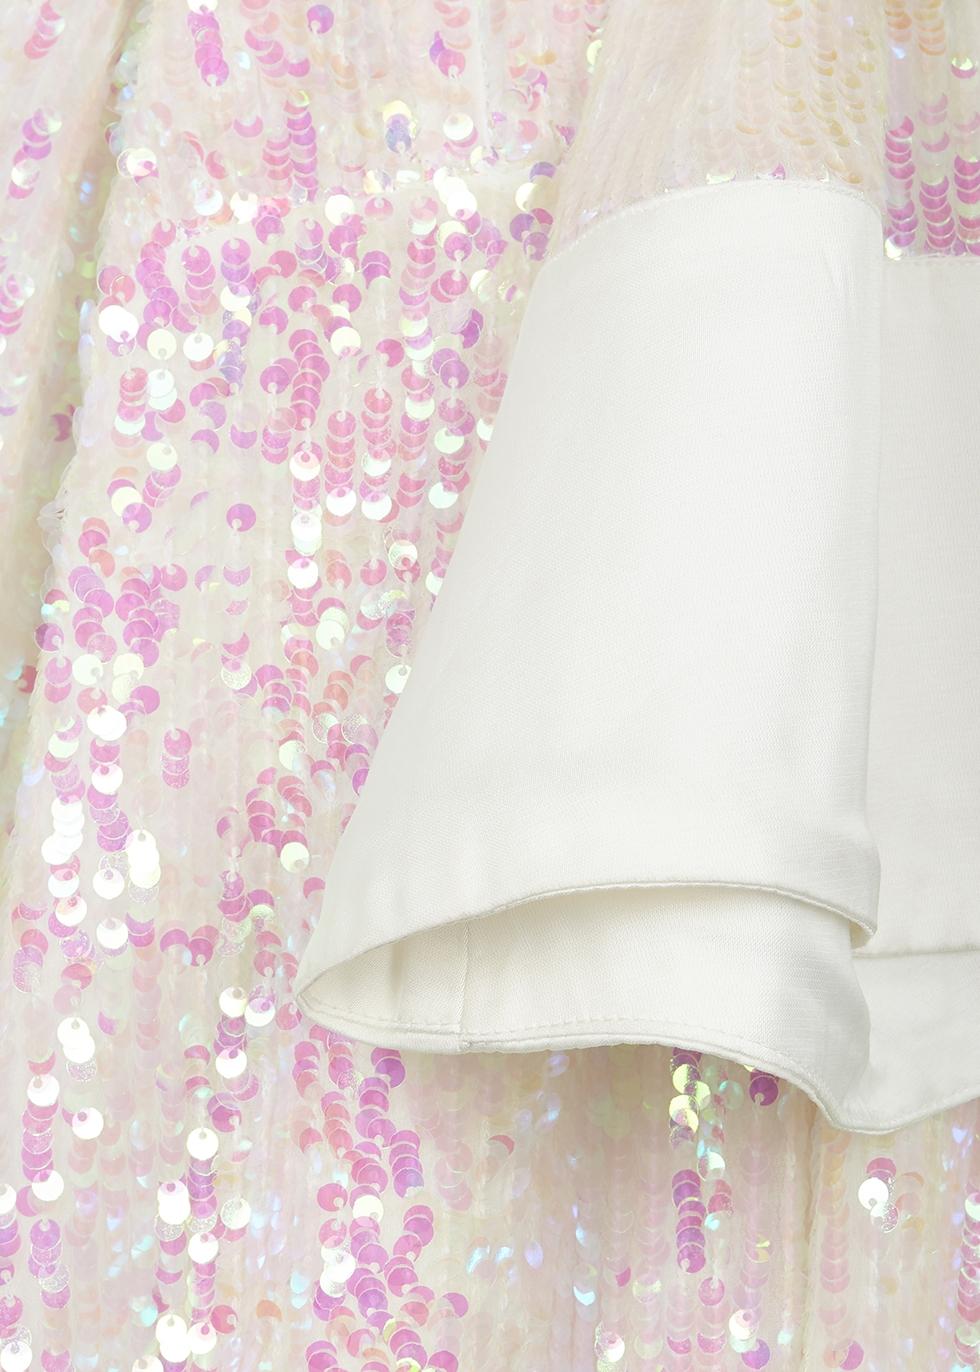 Bia iridescent sequin jumpsuit - Temperley